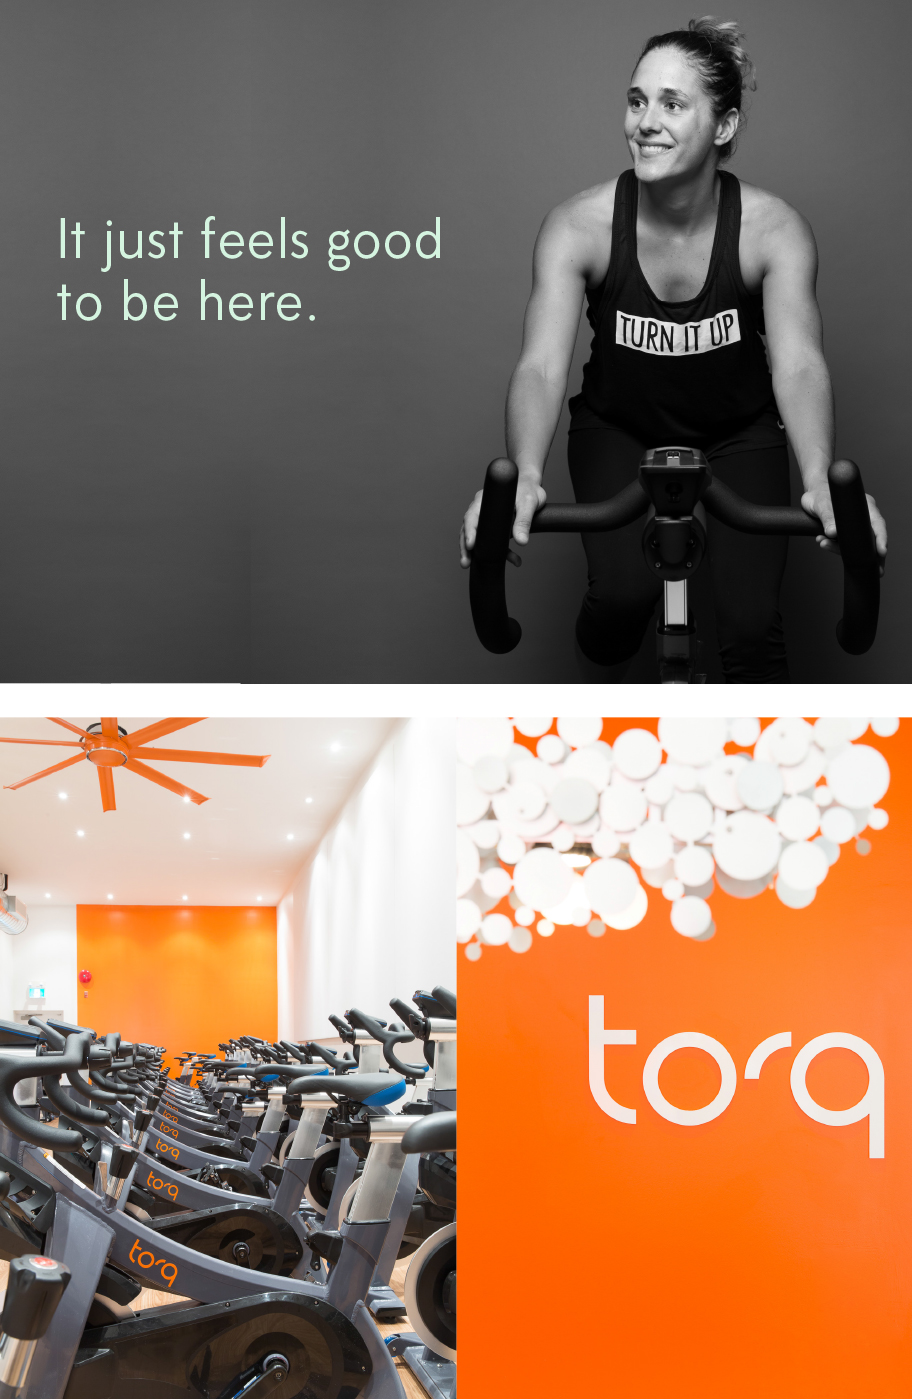 torq-image-1